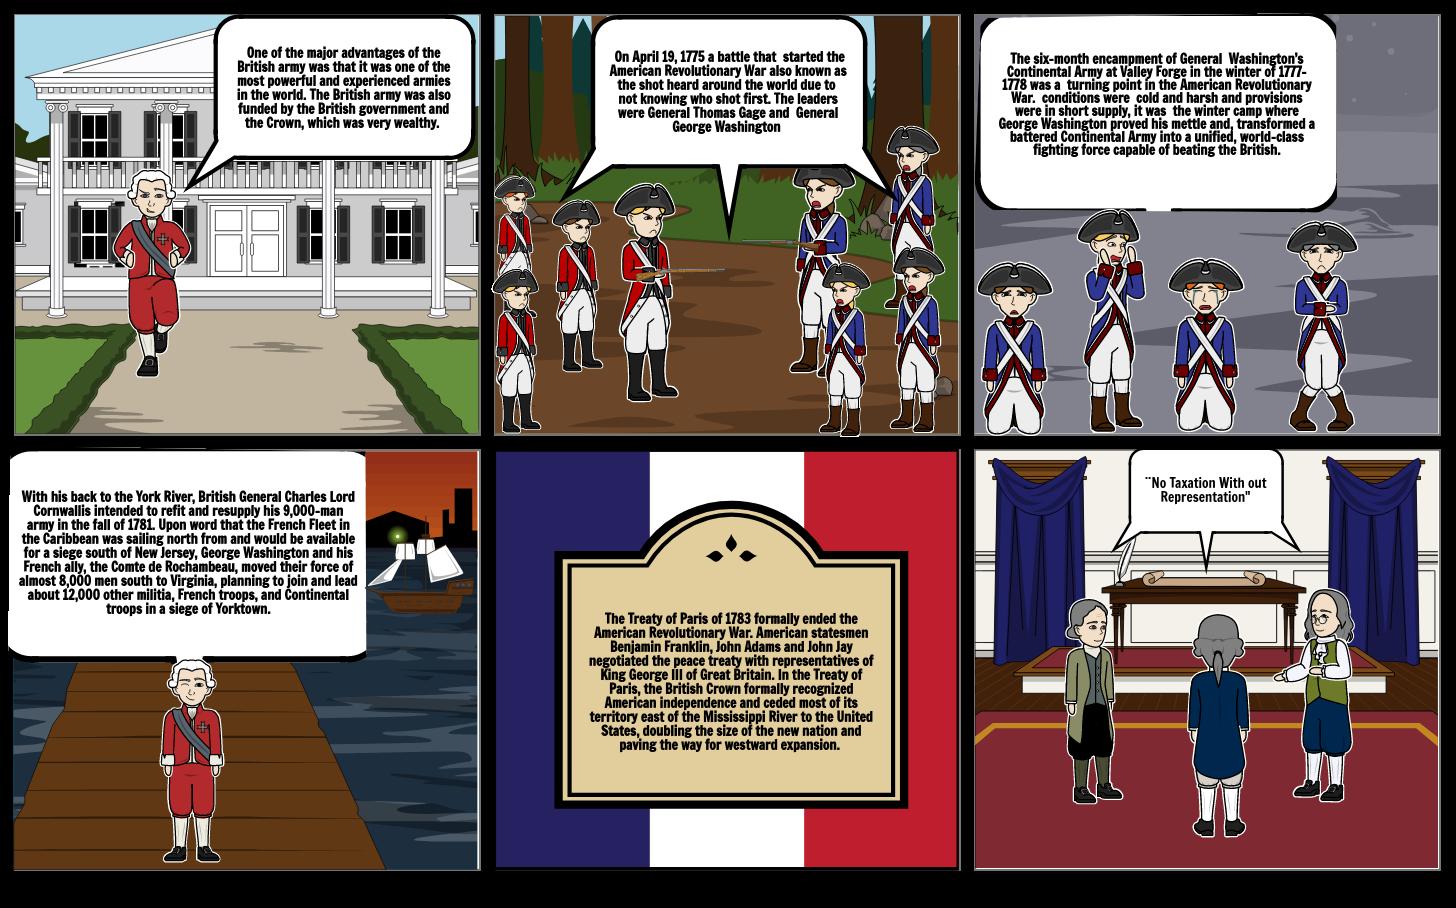 The american revolution pt2